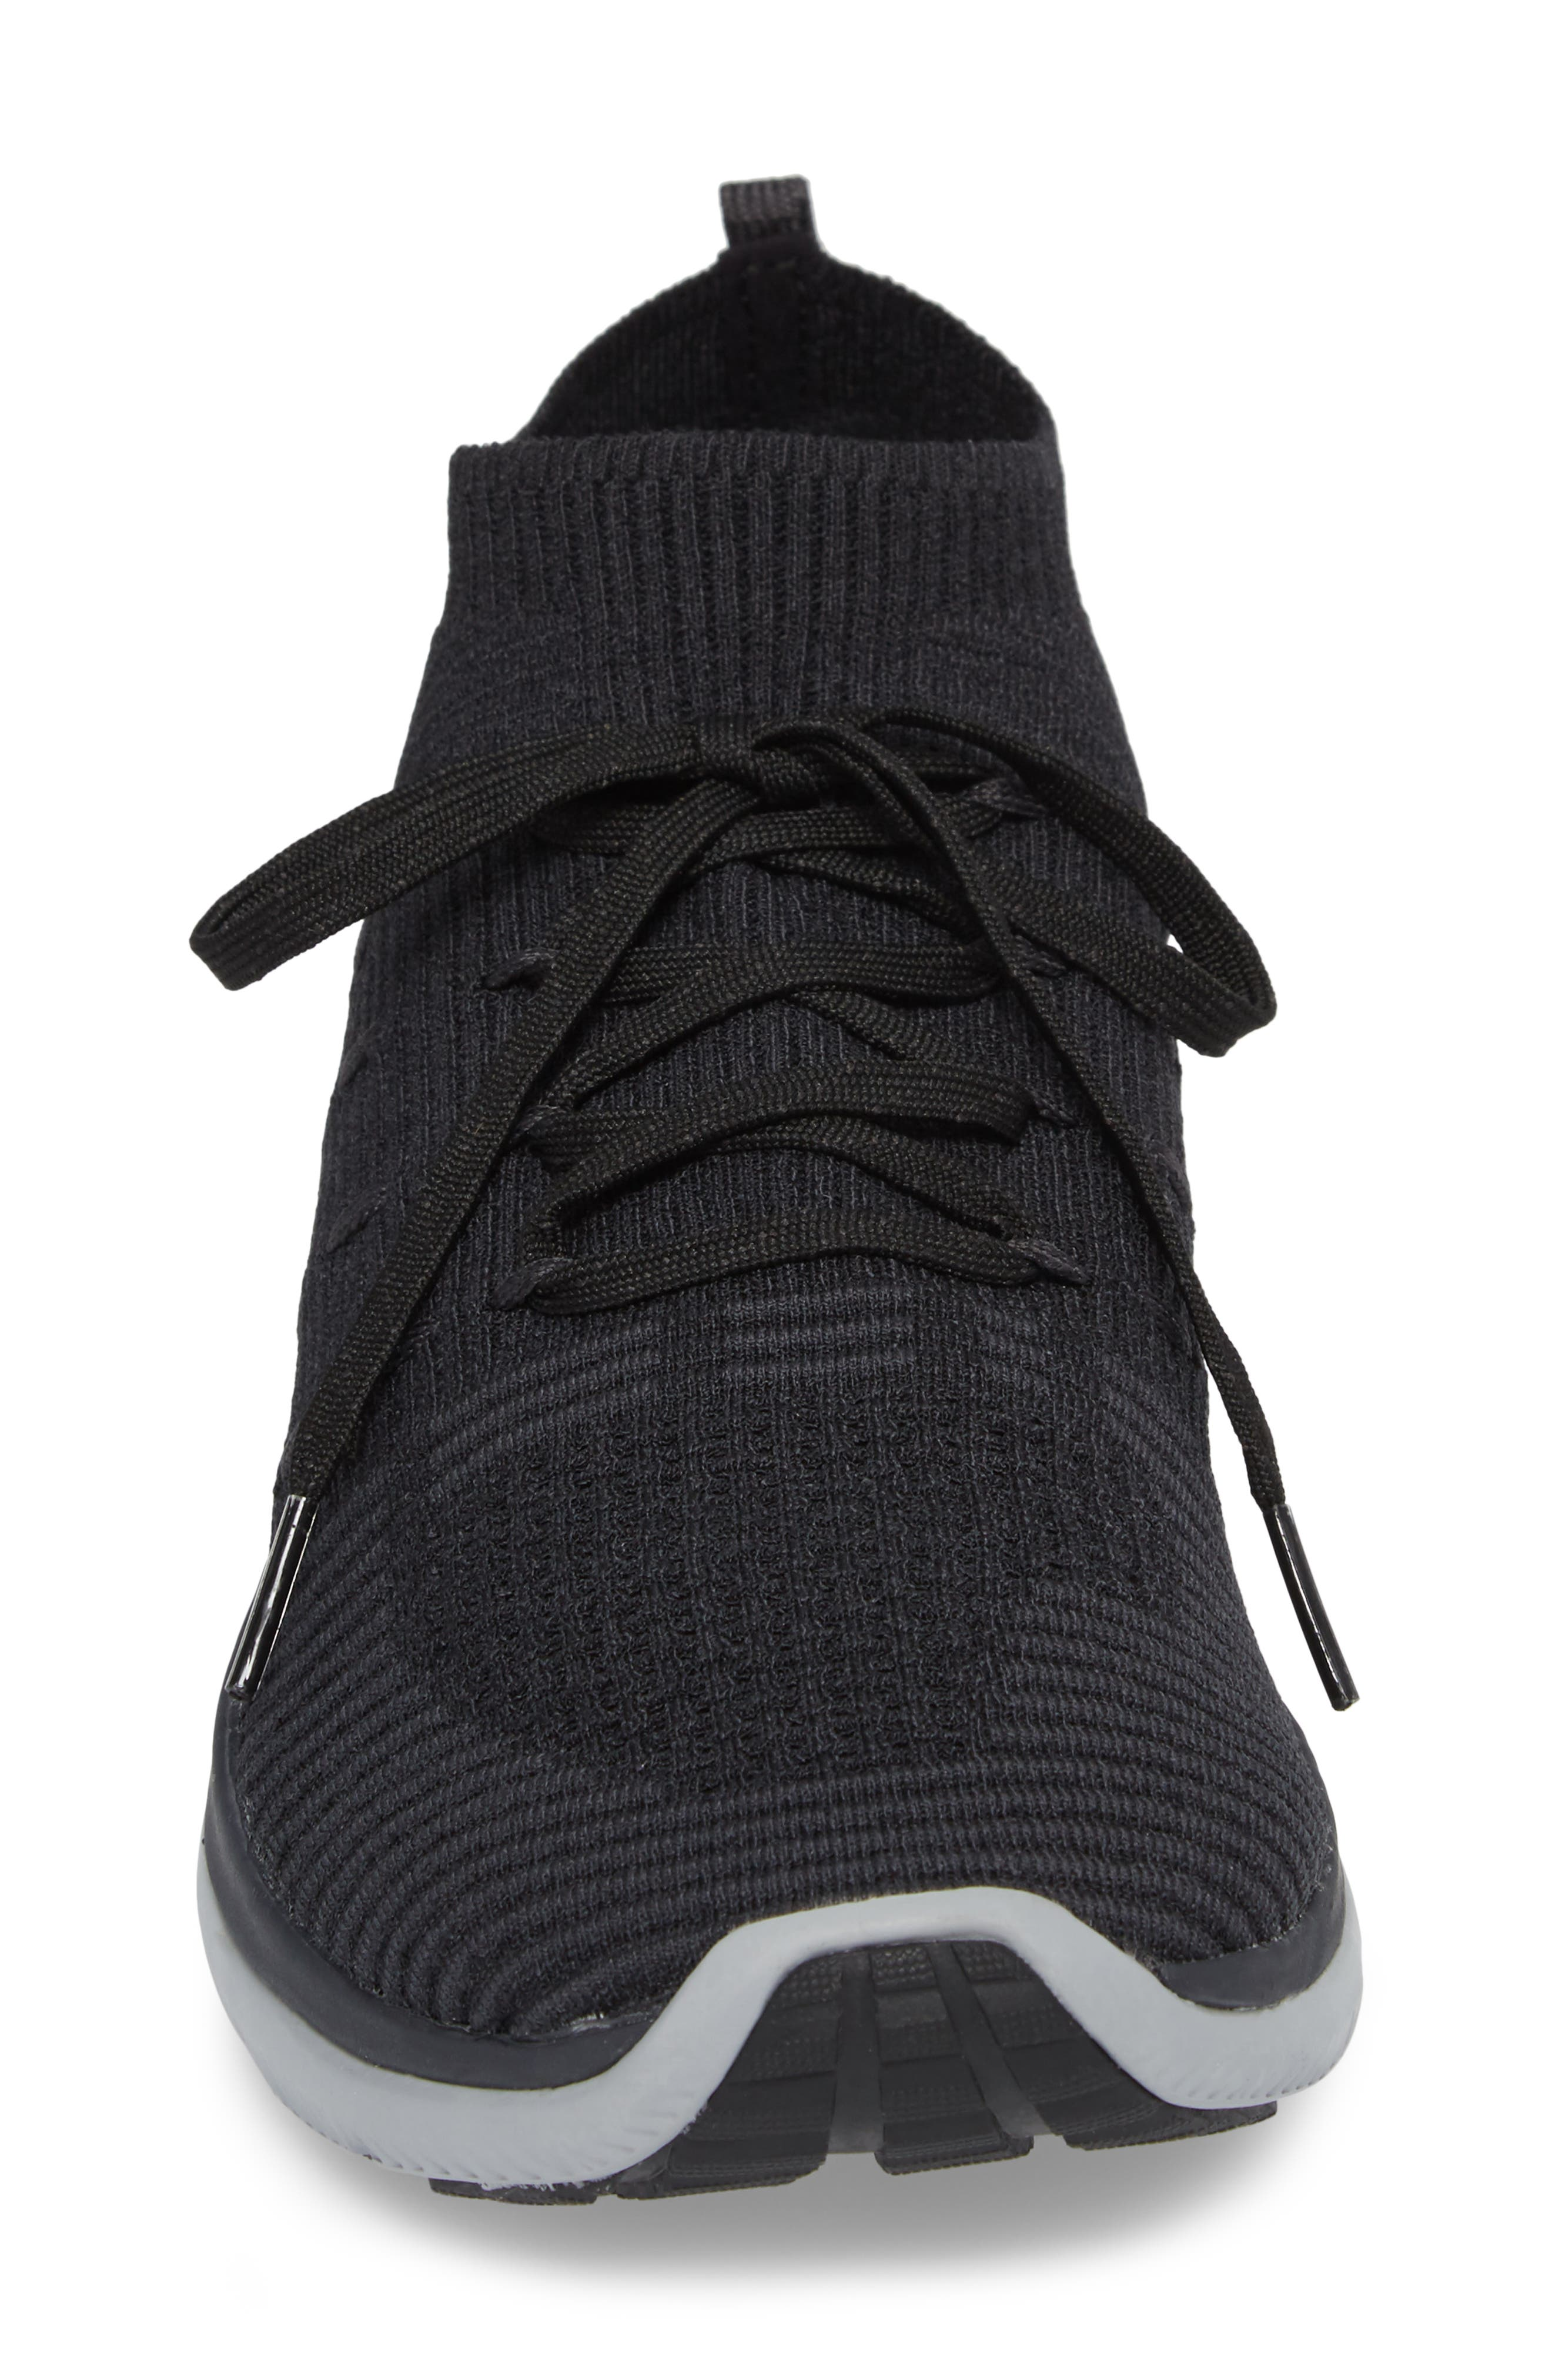 Slingflex Rise Sneaker,                             Alternate thumbnail 4, color,                             BLACK / ANTHRACITE / BLACK